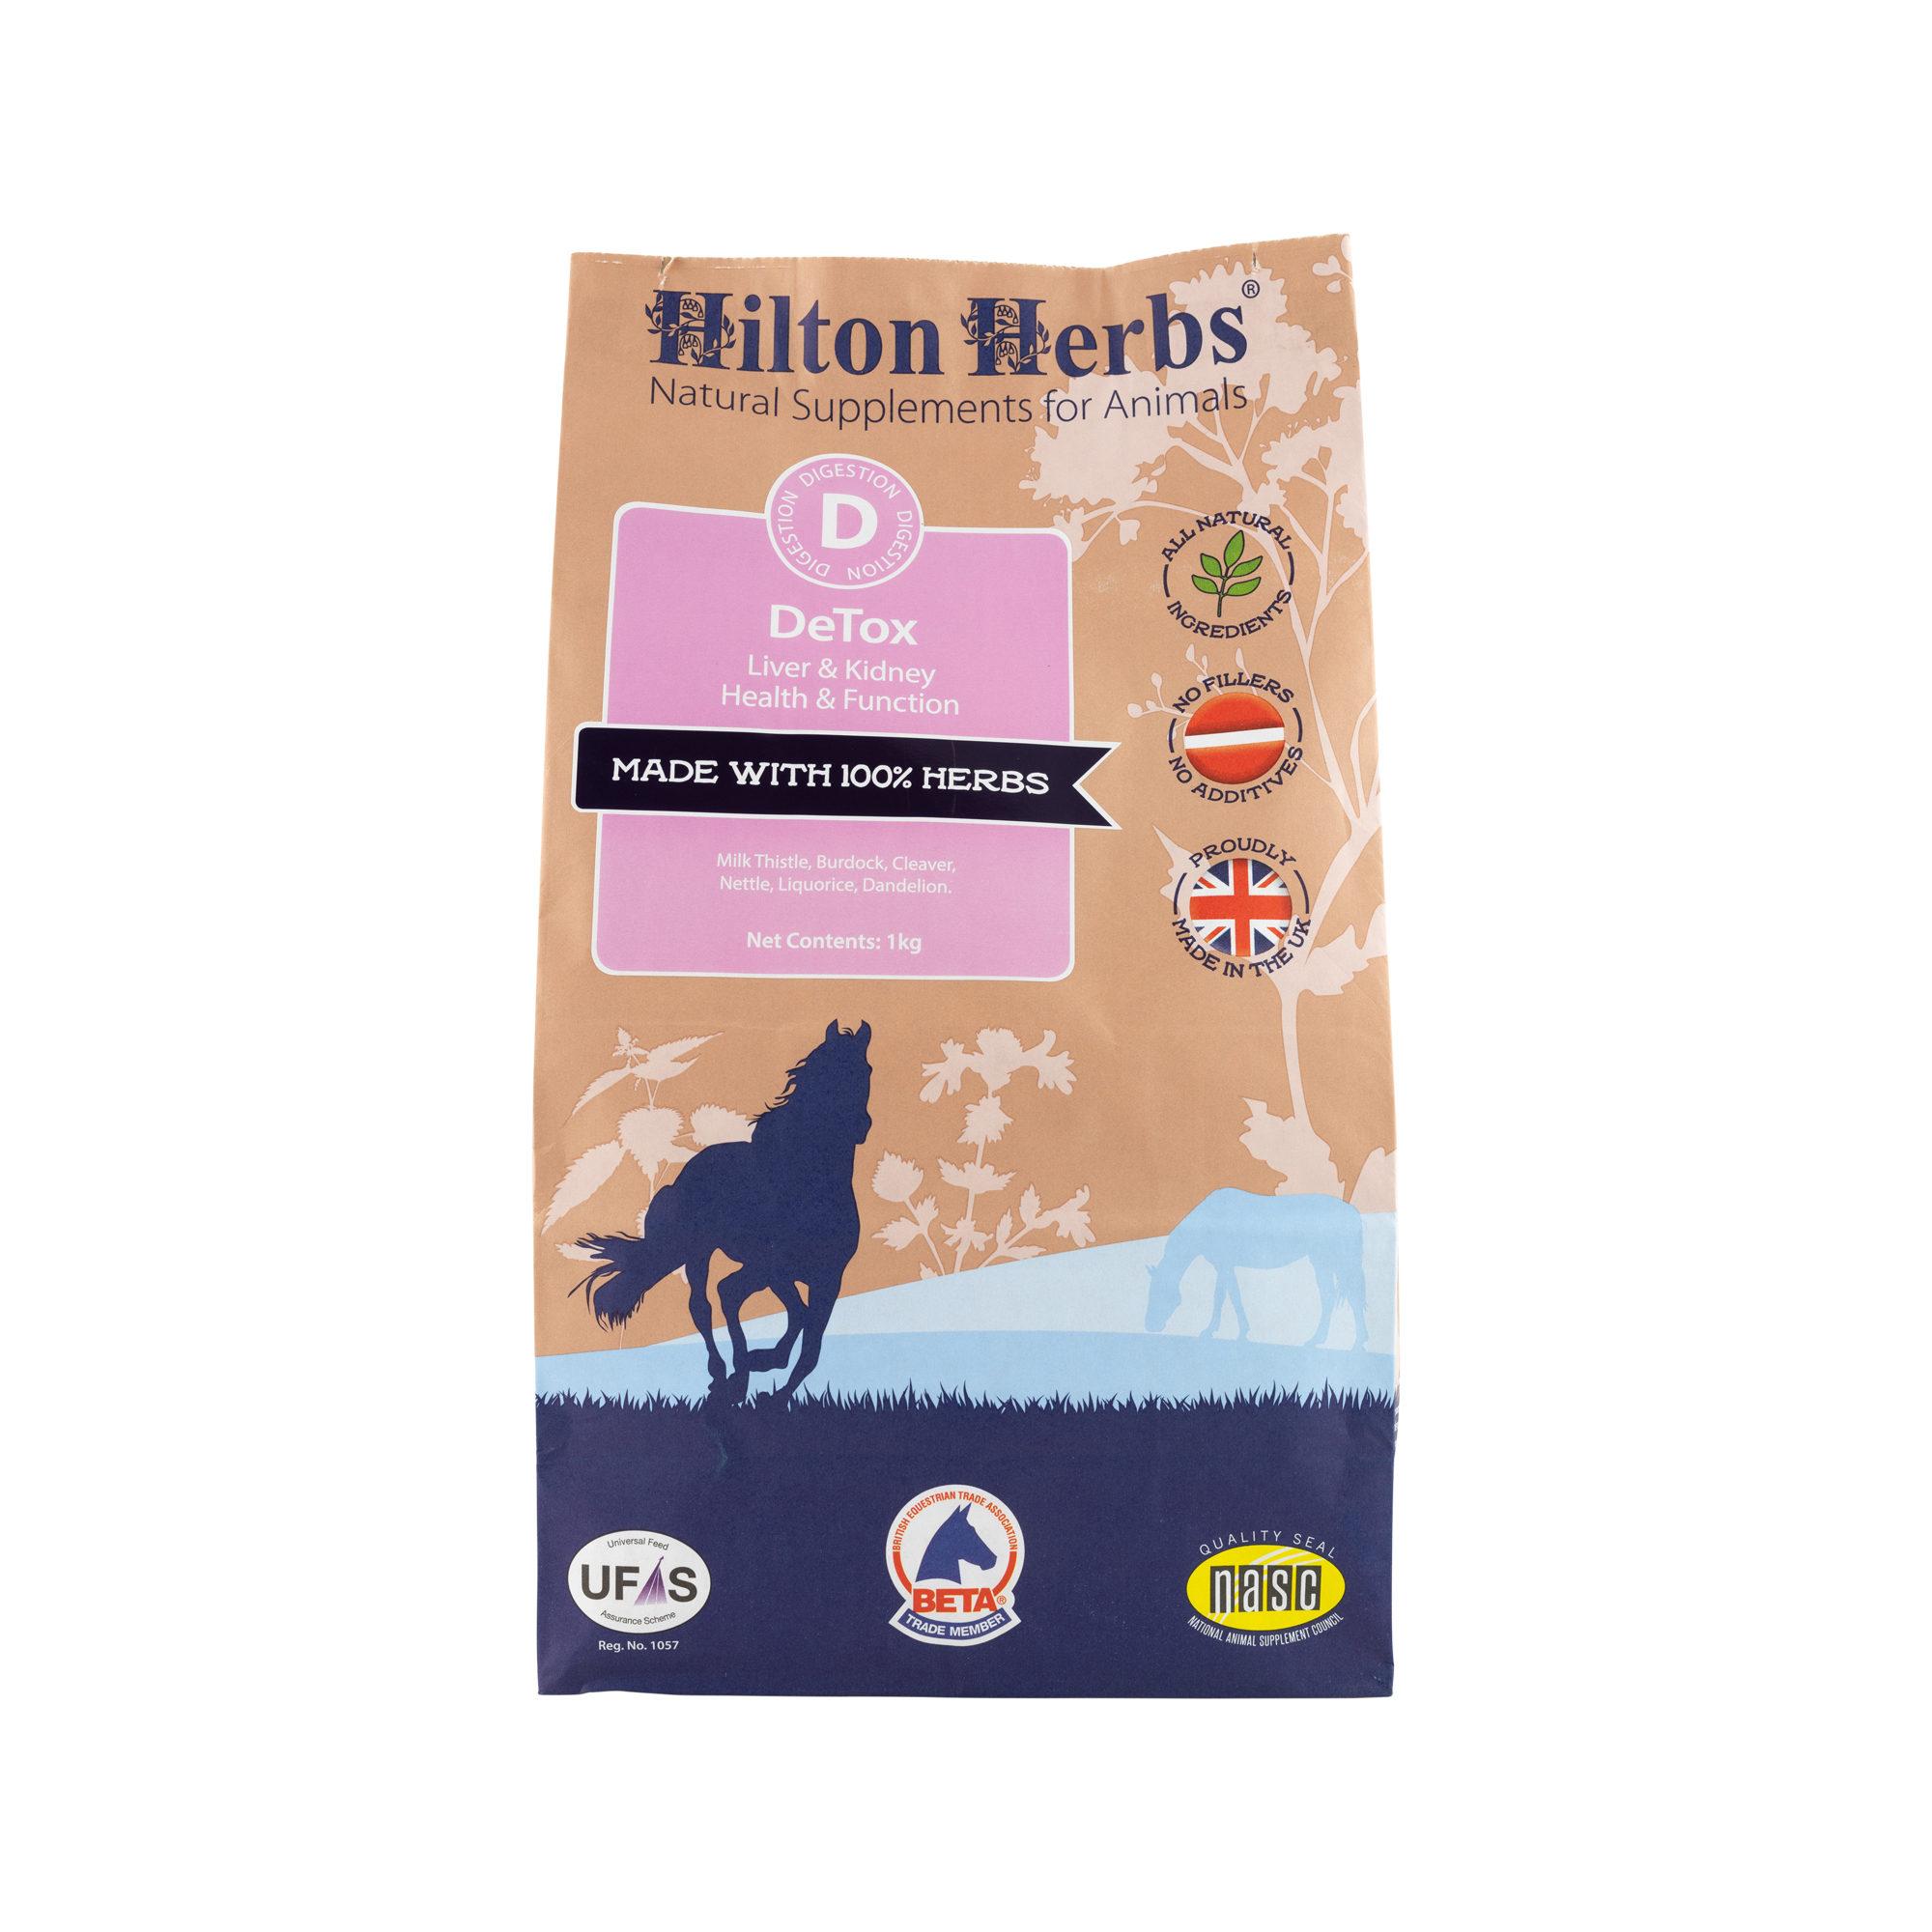 Hilton Herbs Detox for Horses - Poudre